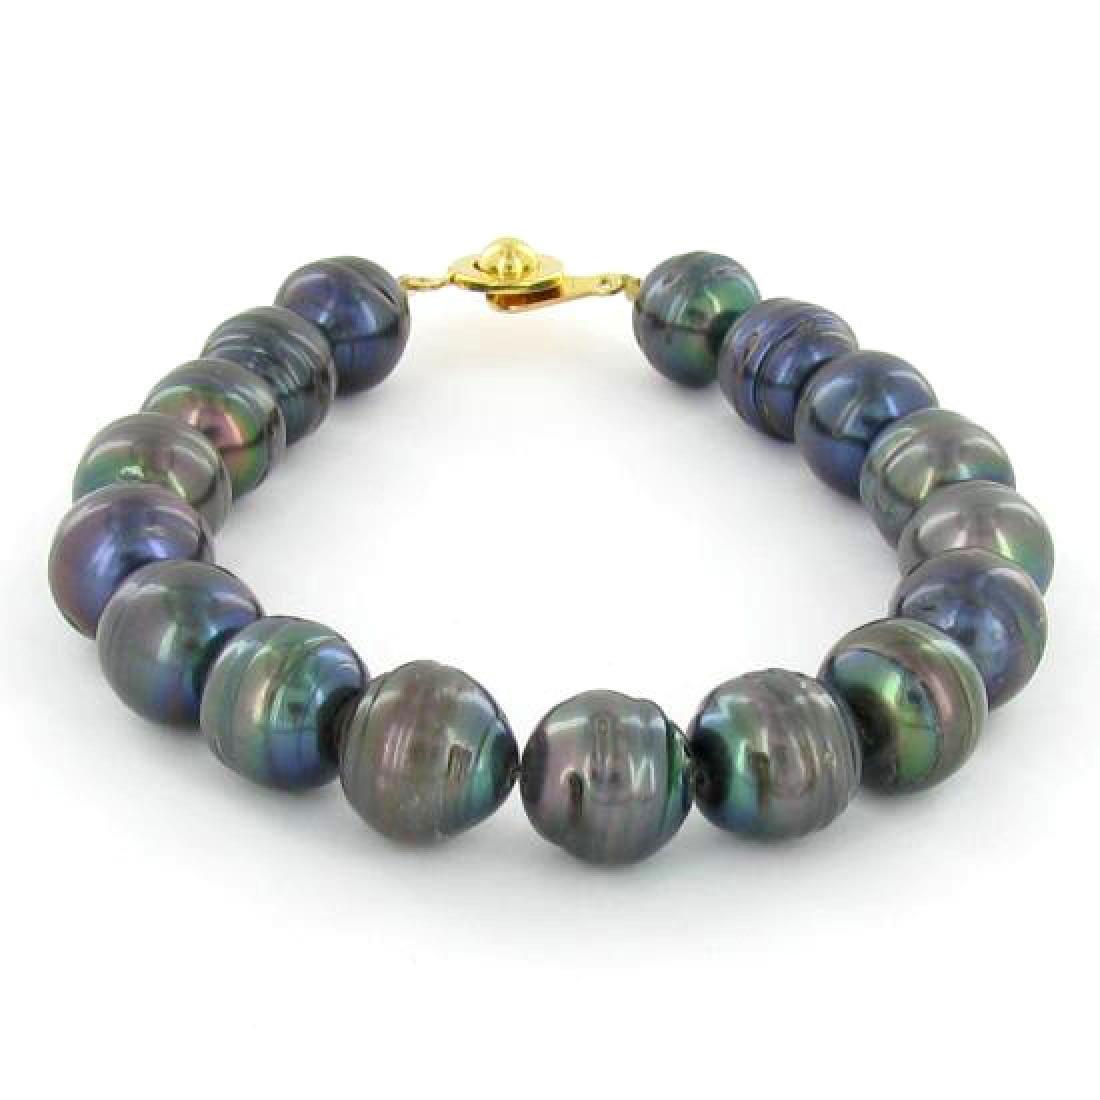 Saltwater Baroque Black Pearl Bracelet